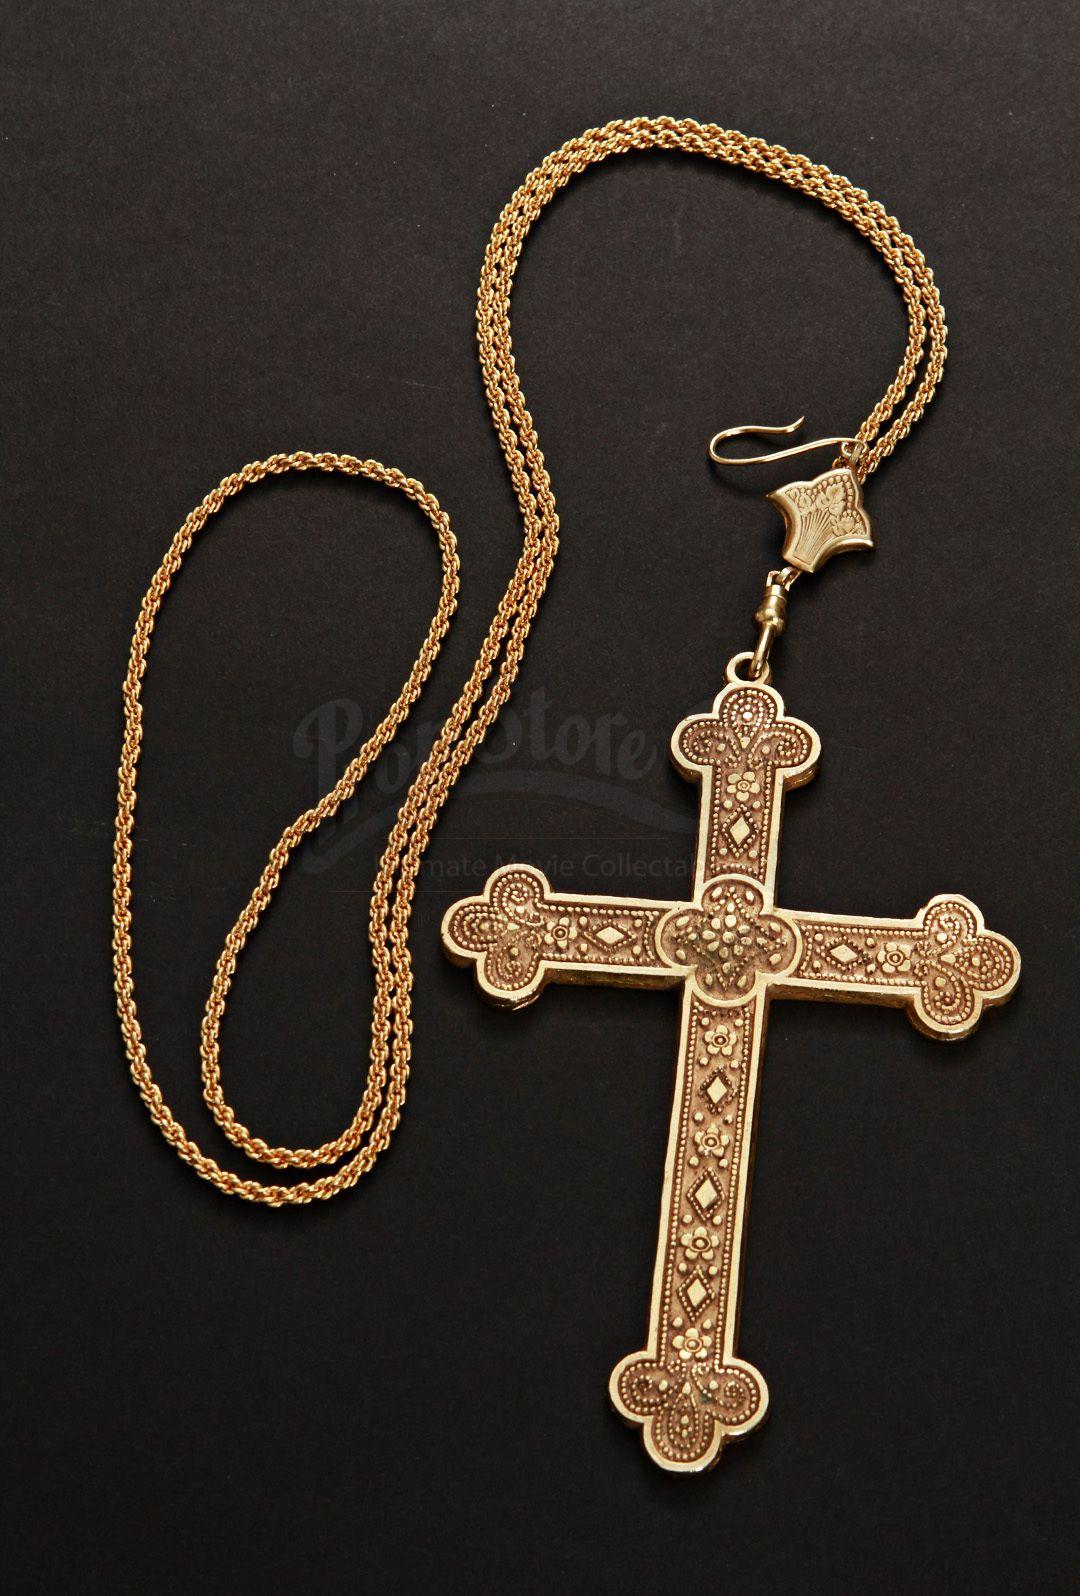 e2130fac44e Gold Catholic Cross Necklace | Products | Catholic cross necklace ...